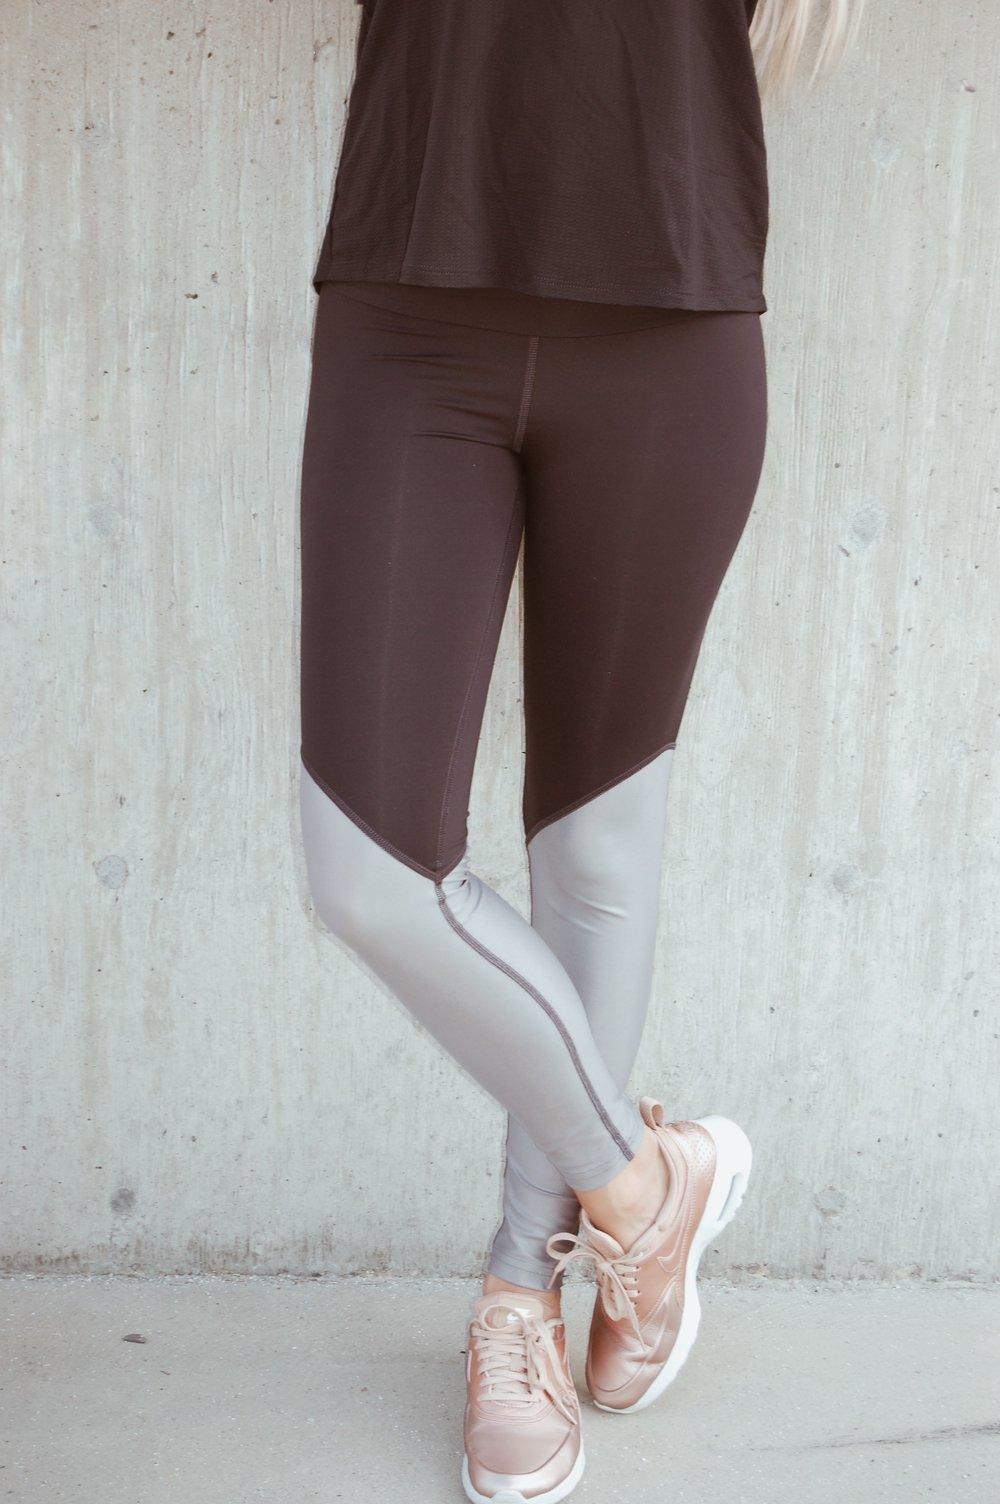 50/50 Pant Black/ Platinum Yoga Pants//  Pheel